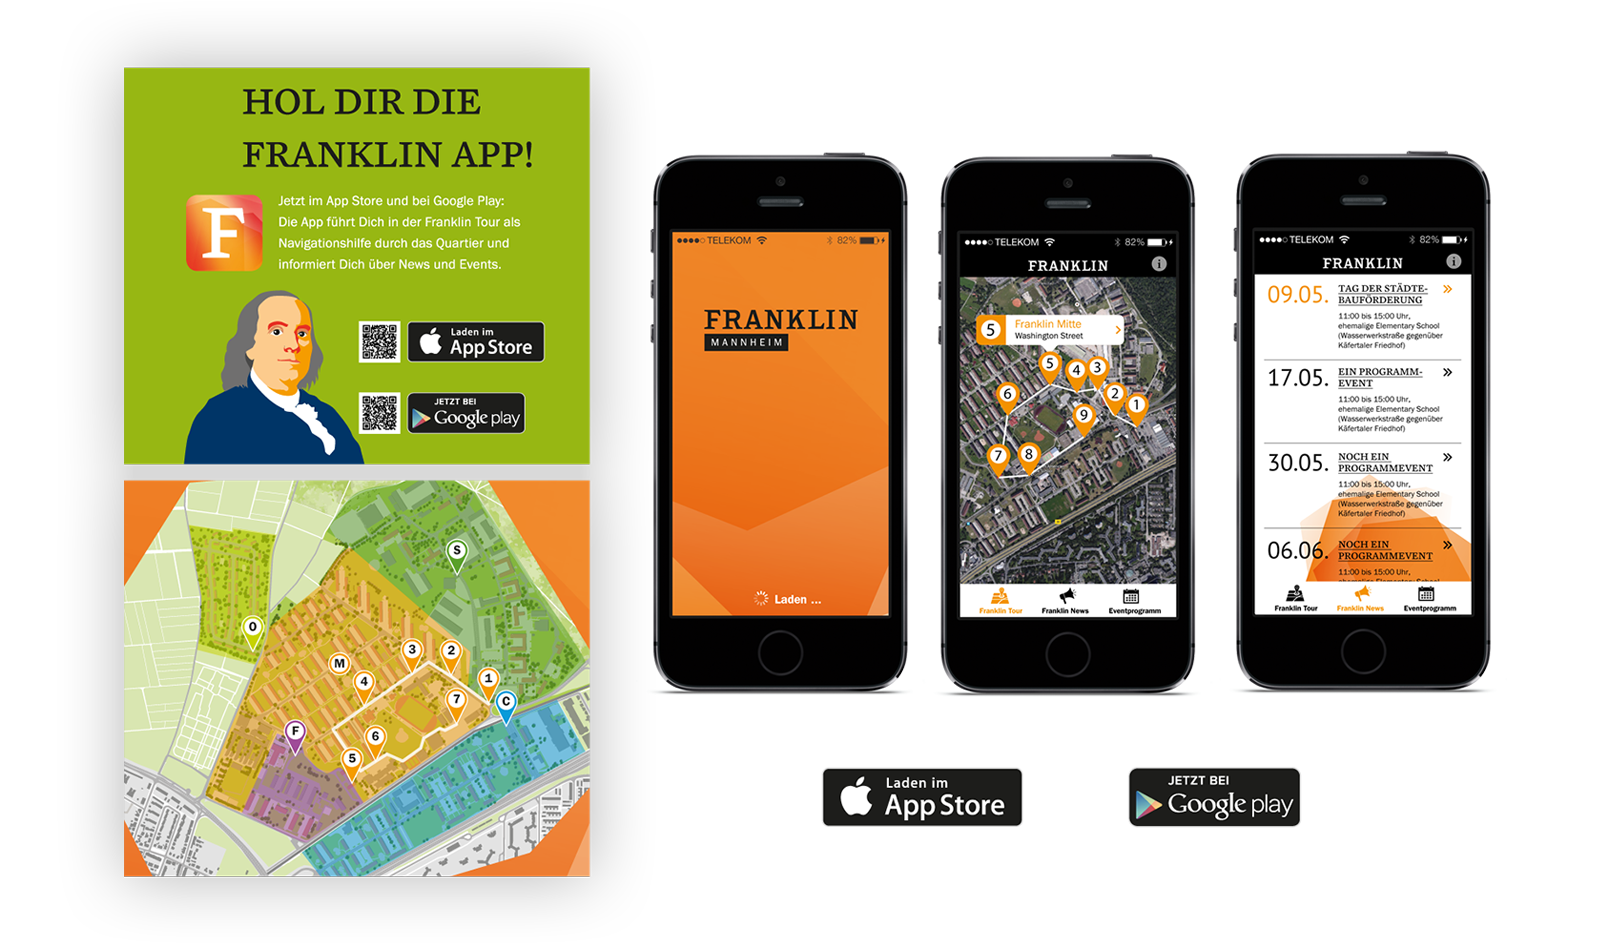 Franklin Mannheim App